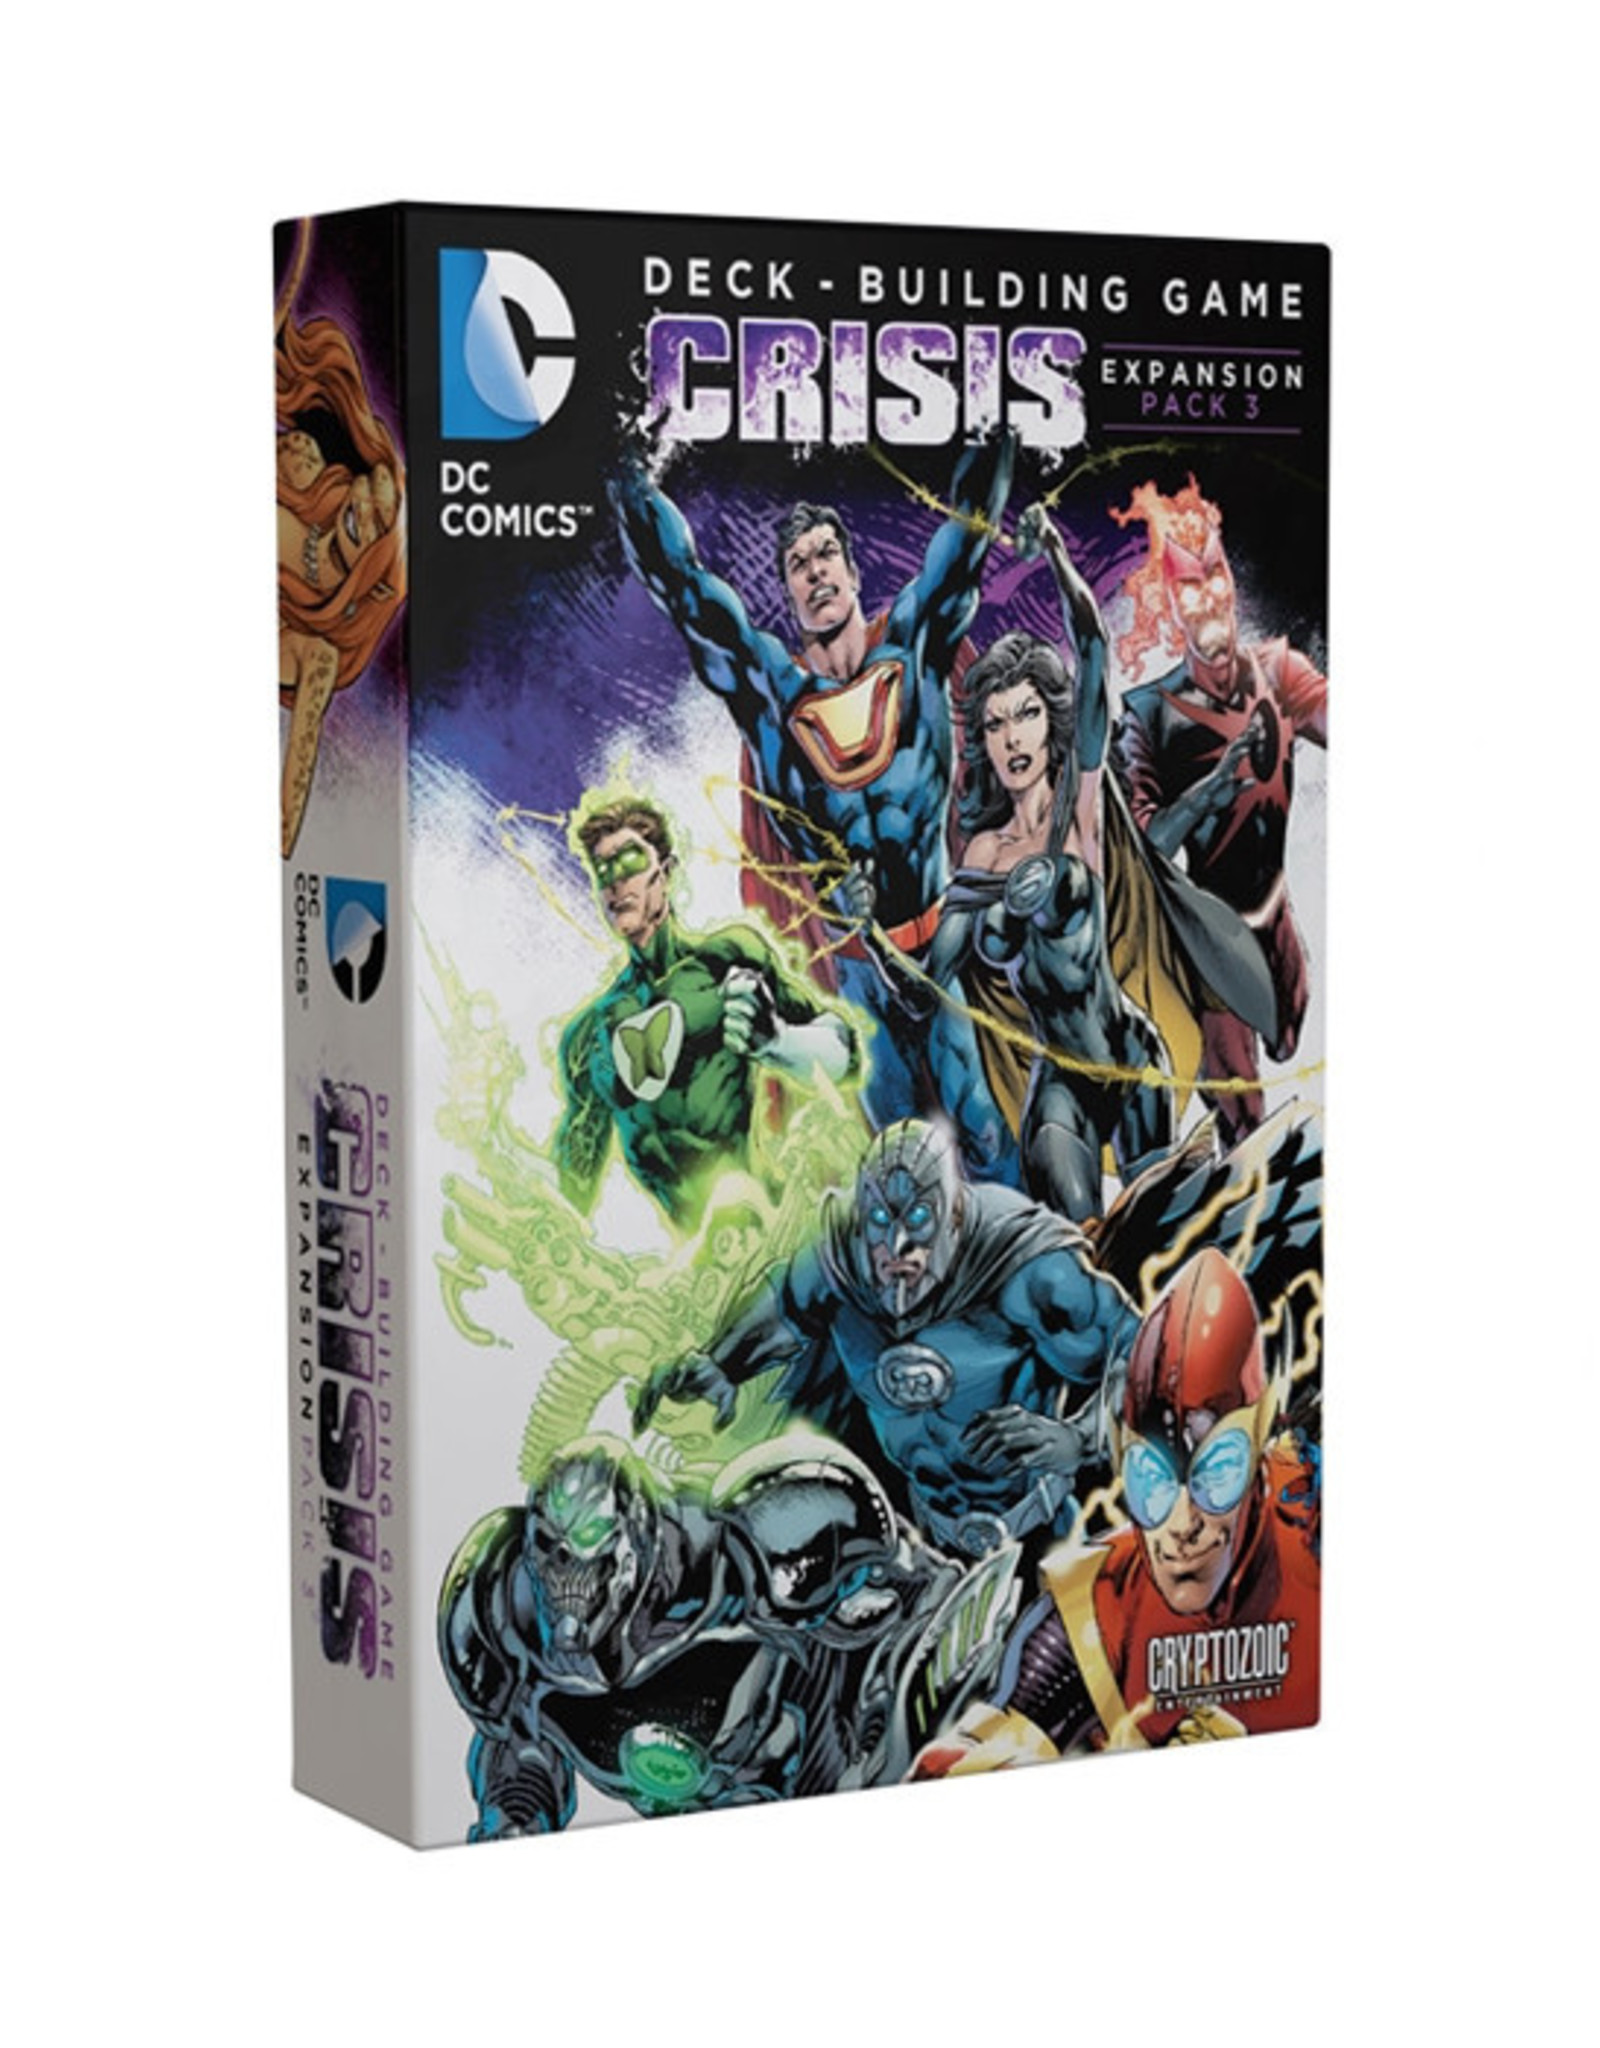 DC Deck Building Game: Crisis - Expansion Pack 3